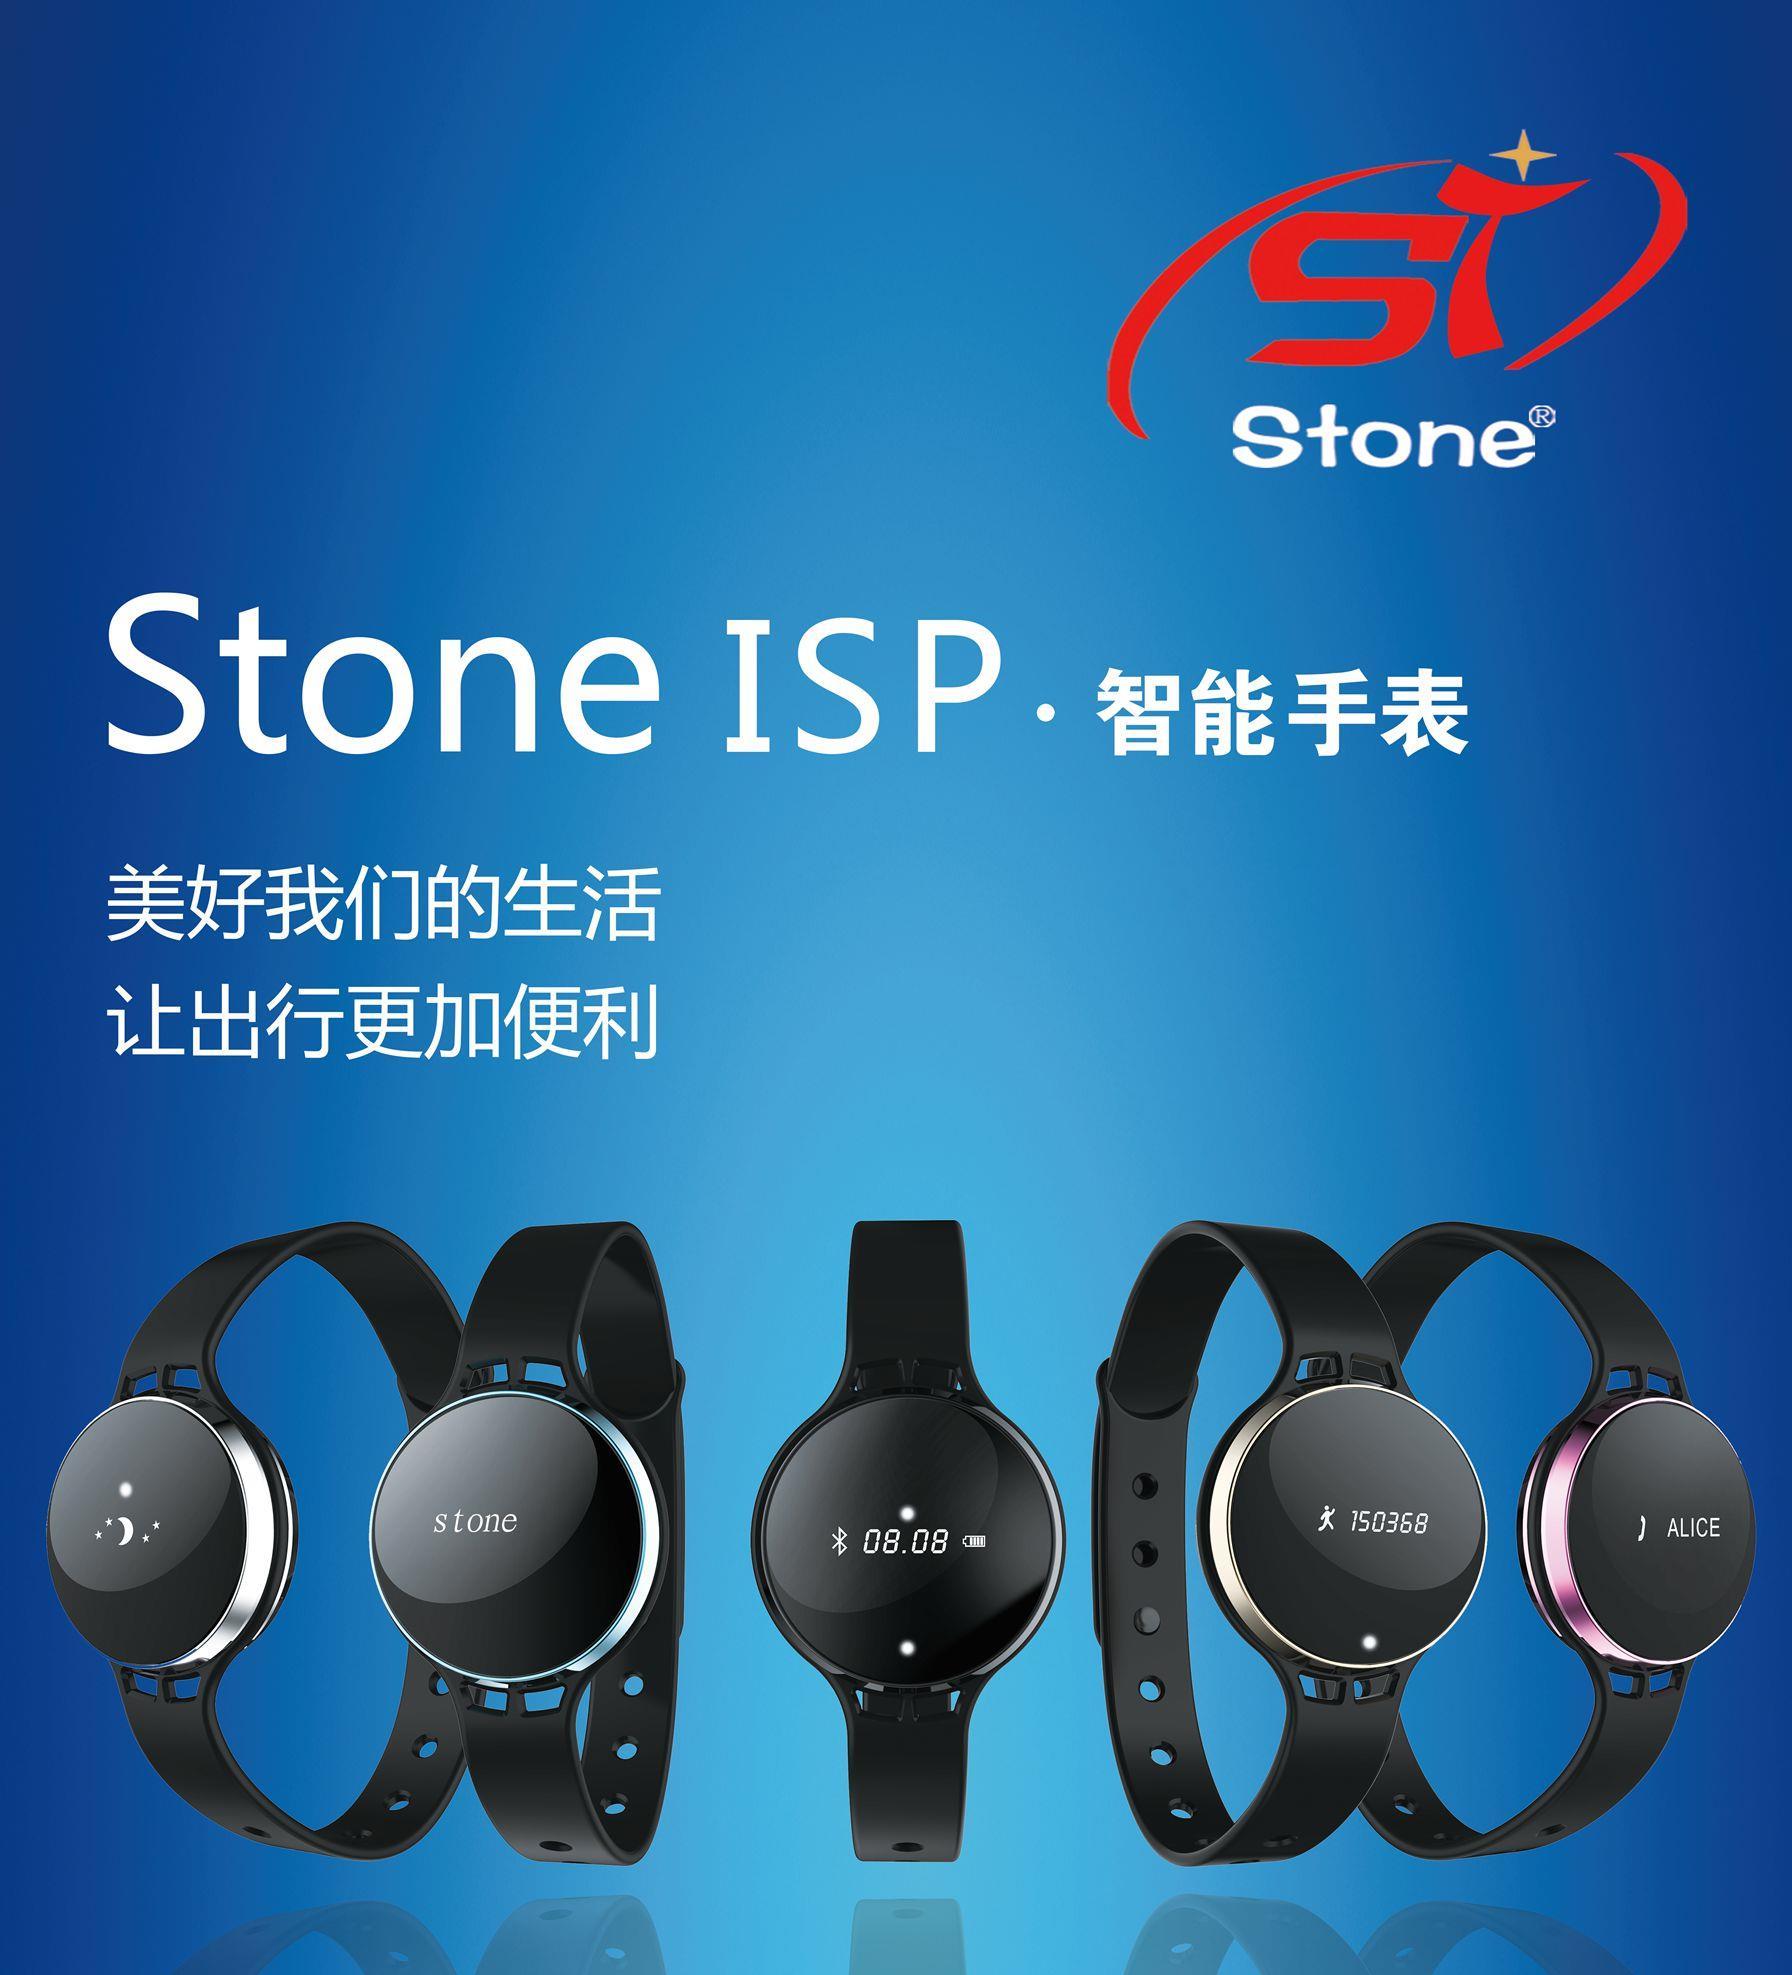 stone智能手表招商